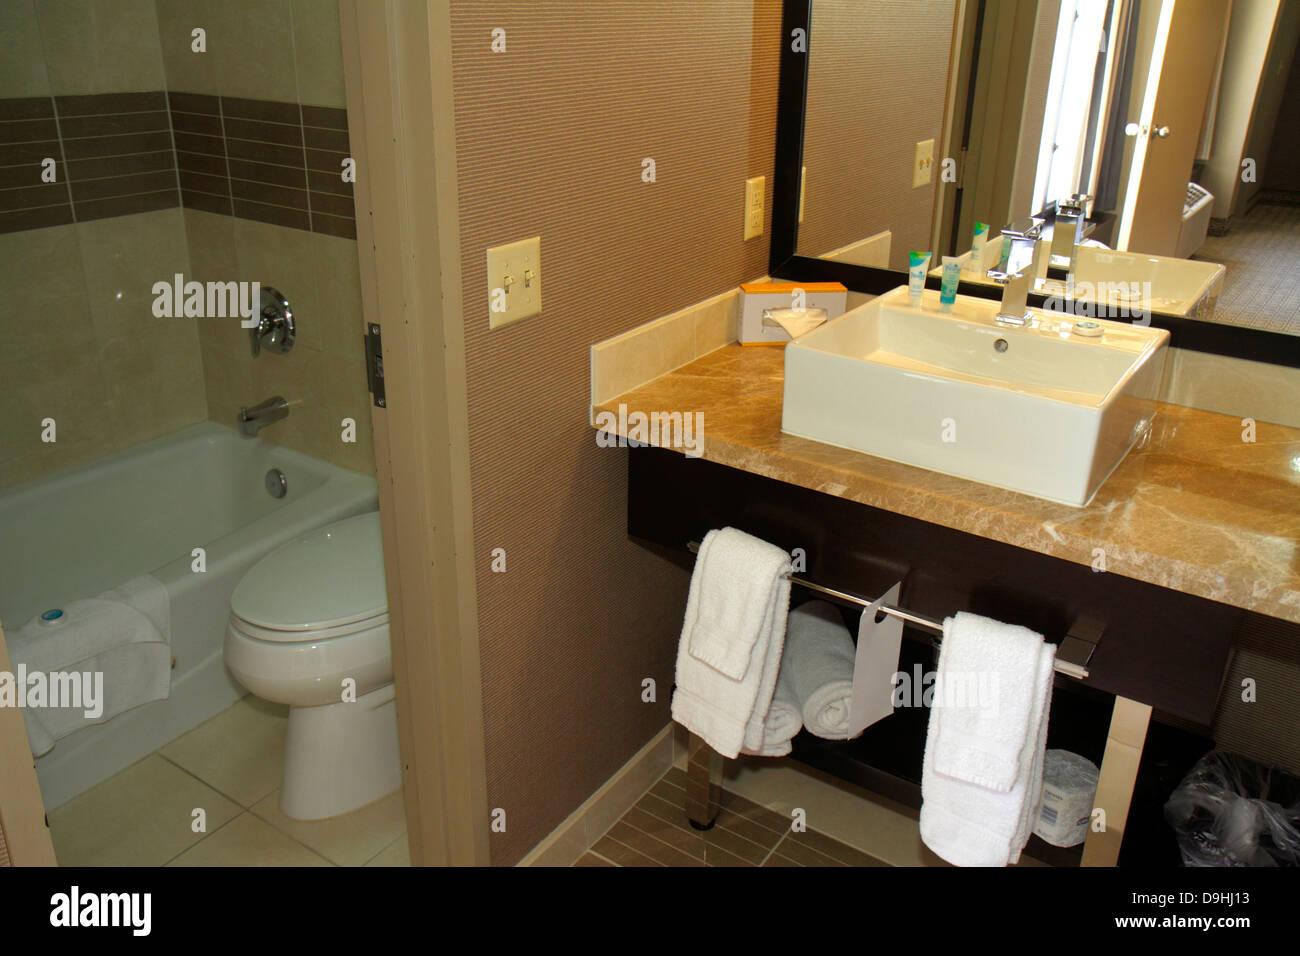 Bathroom Sinks Las Vegas nevada las vegas freemont street plaza hotel & casino hotel guest